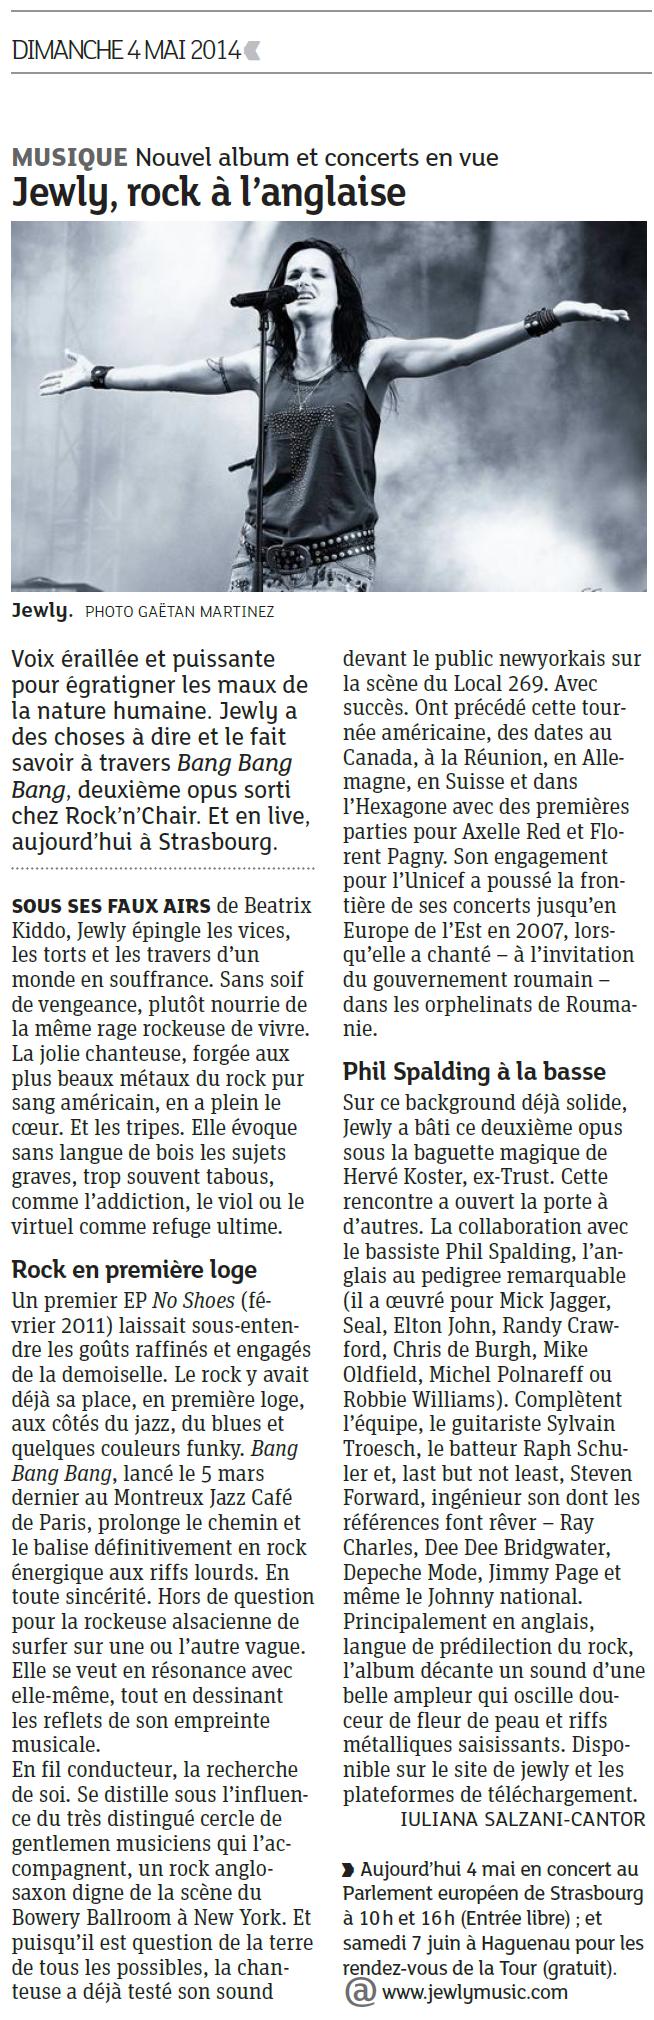 DNA – 04/05/2014